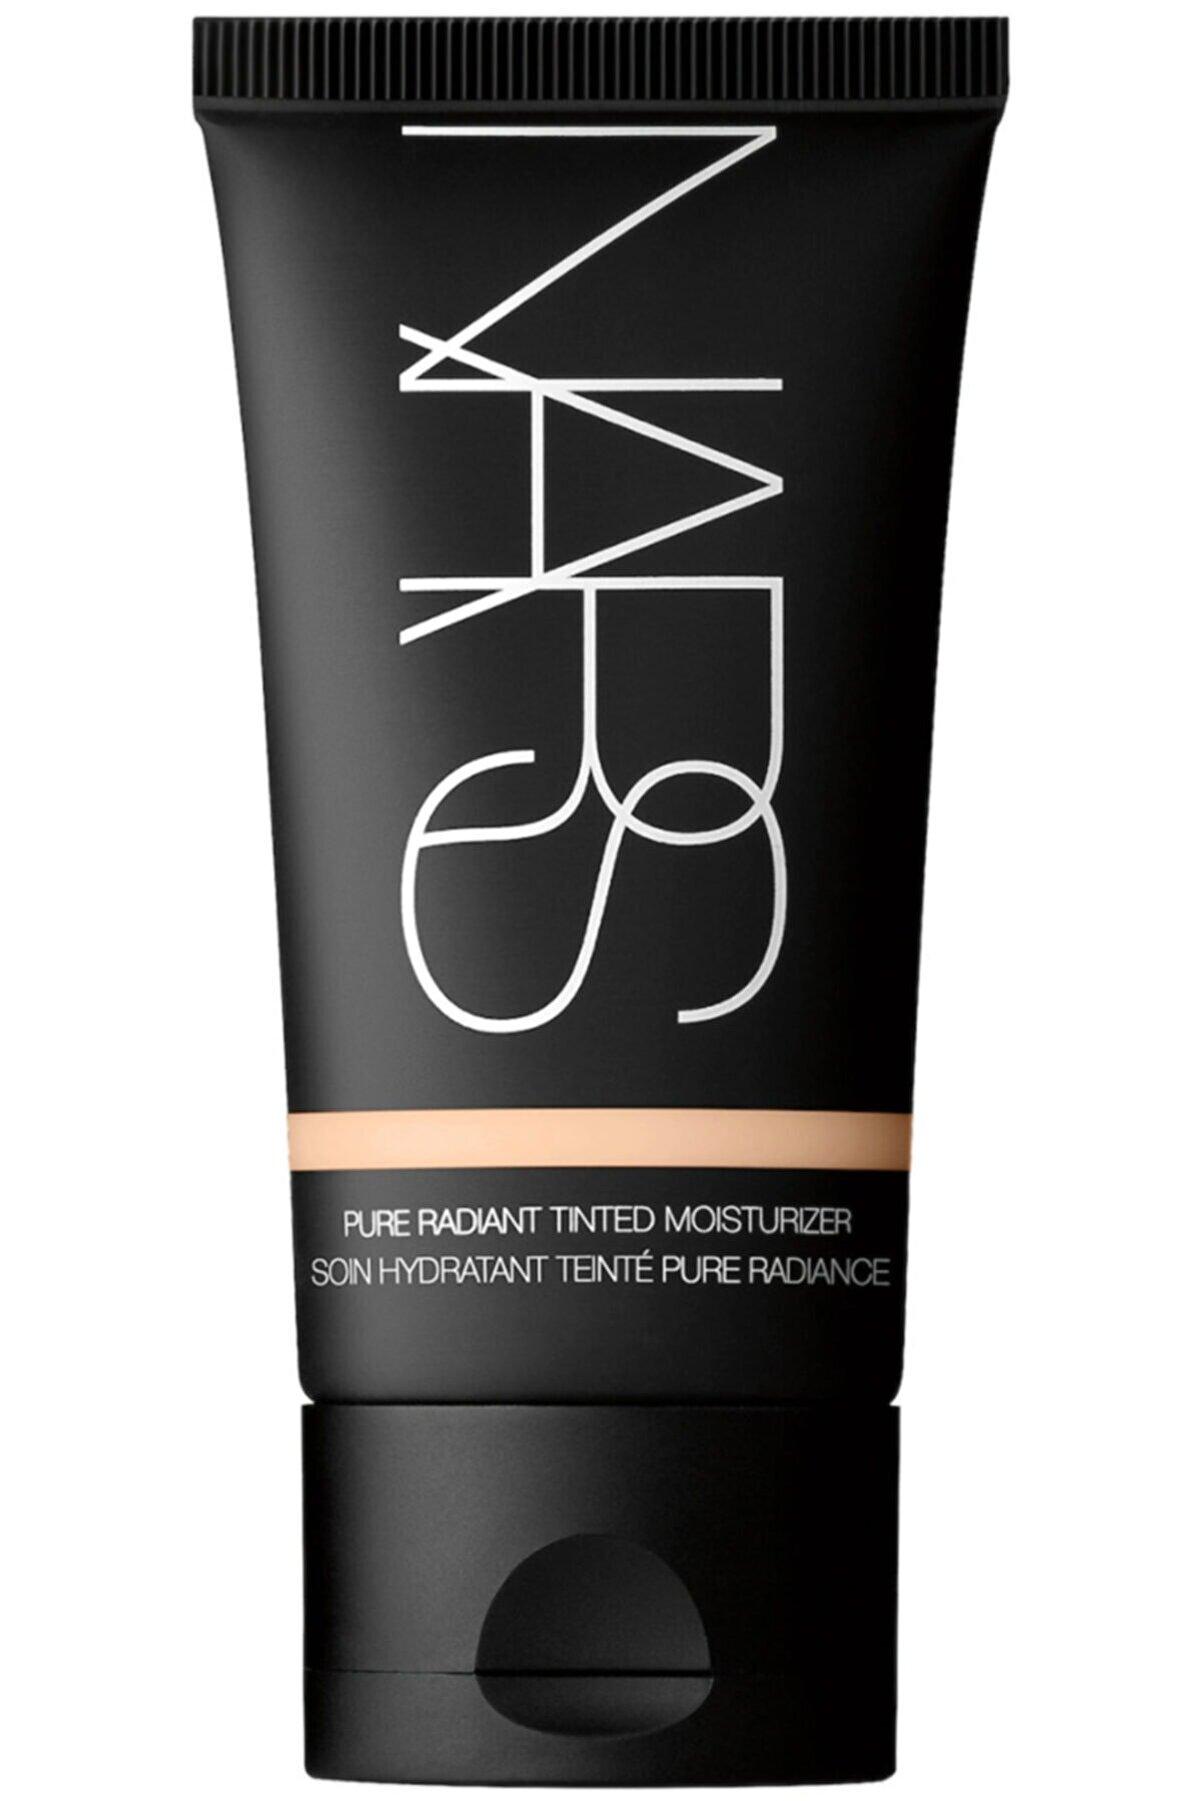 Nars Pure Radiant Tinted Moisturizer 56 ml